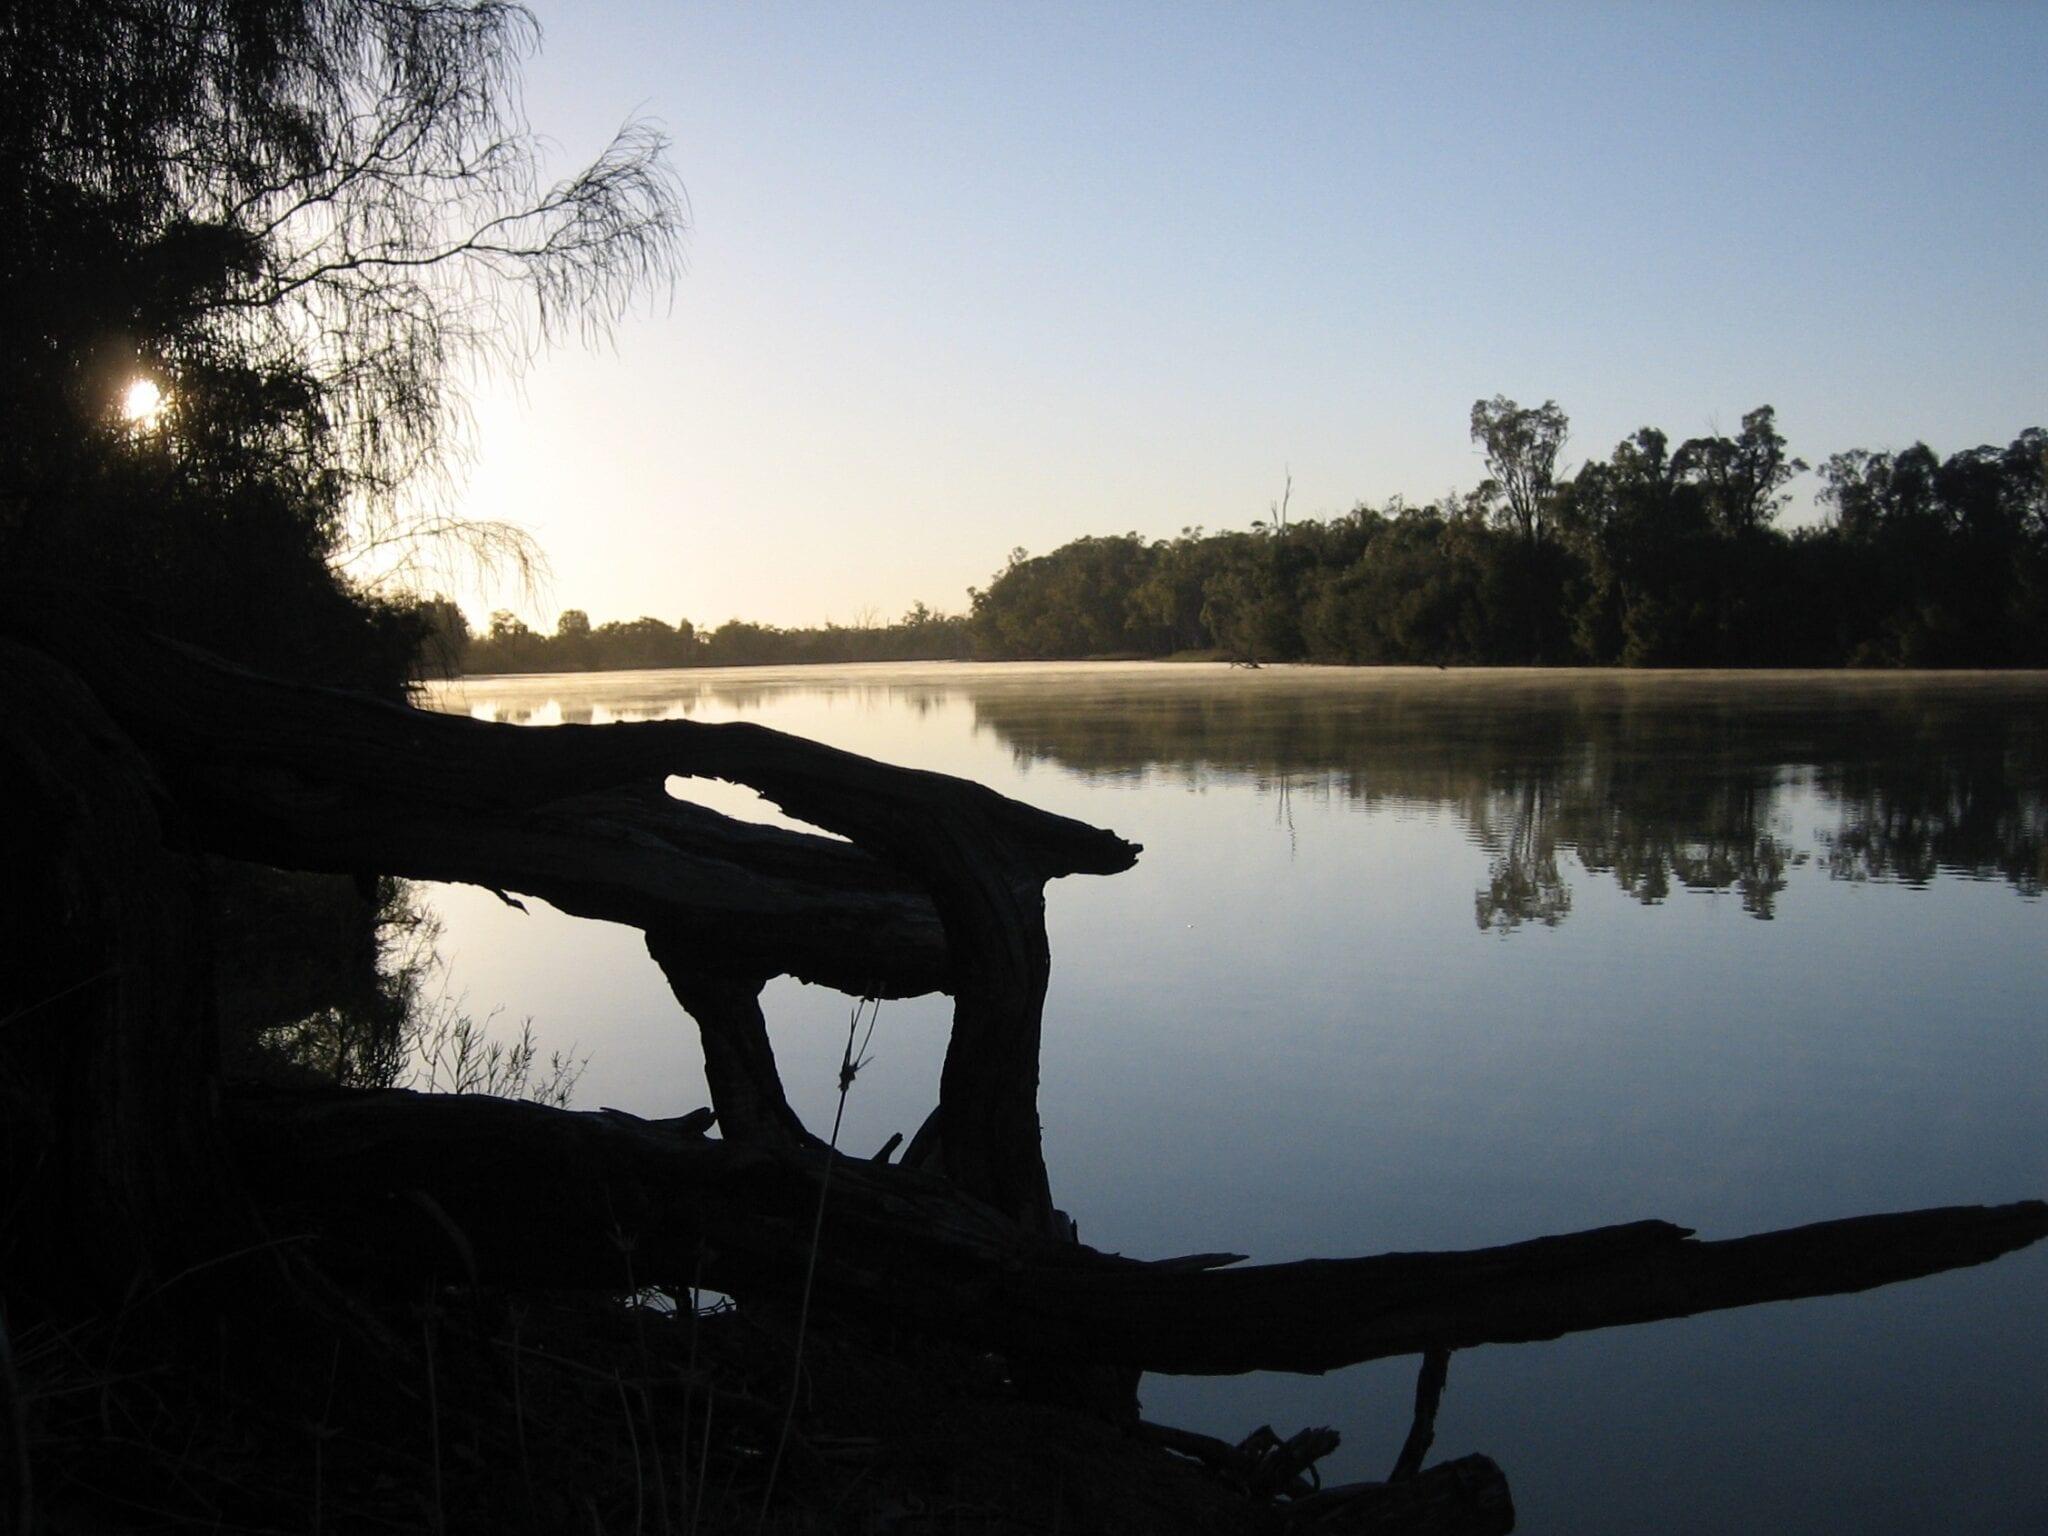 Sunrise on an Australian Outback river.